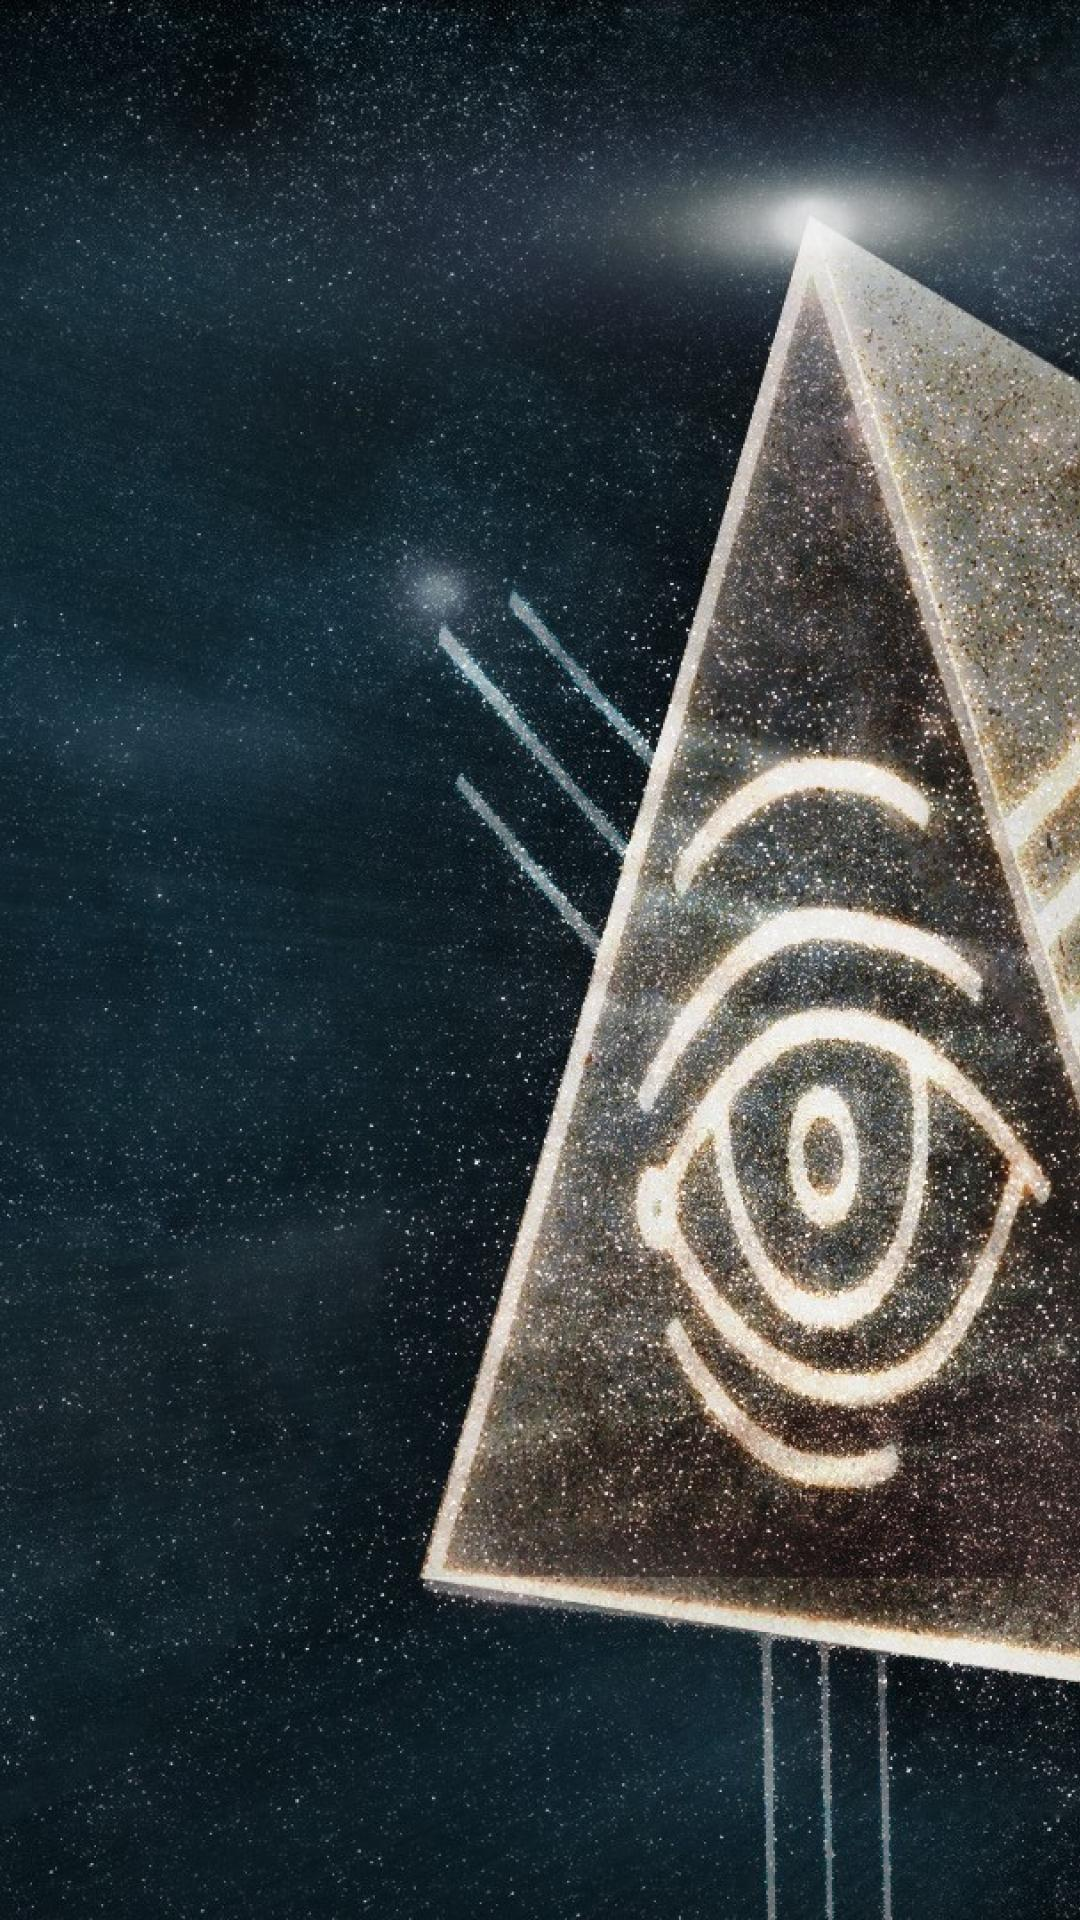 Illuminati Wallpaper For IOS WallpaperSafari